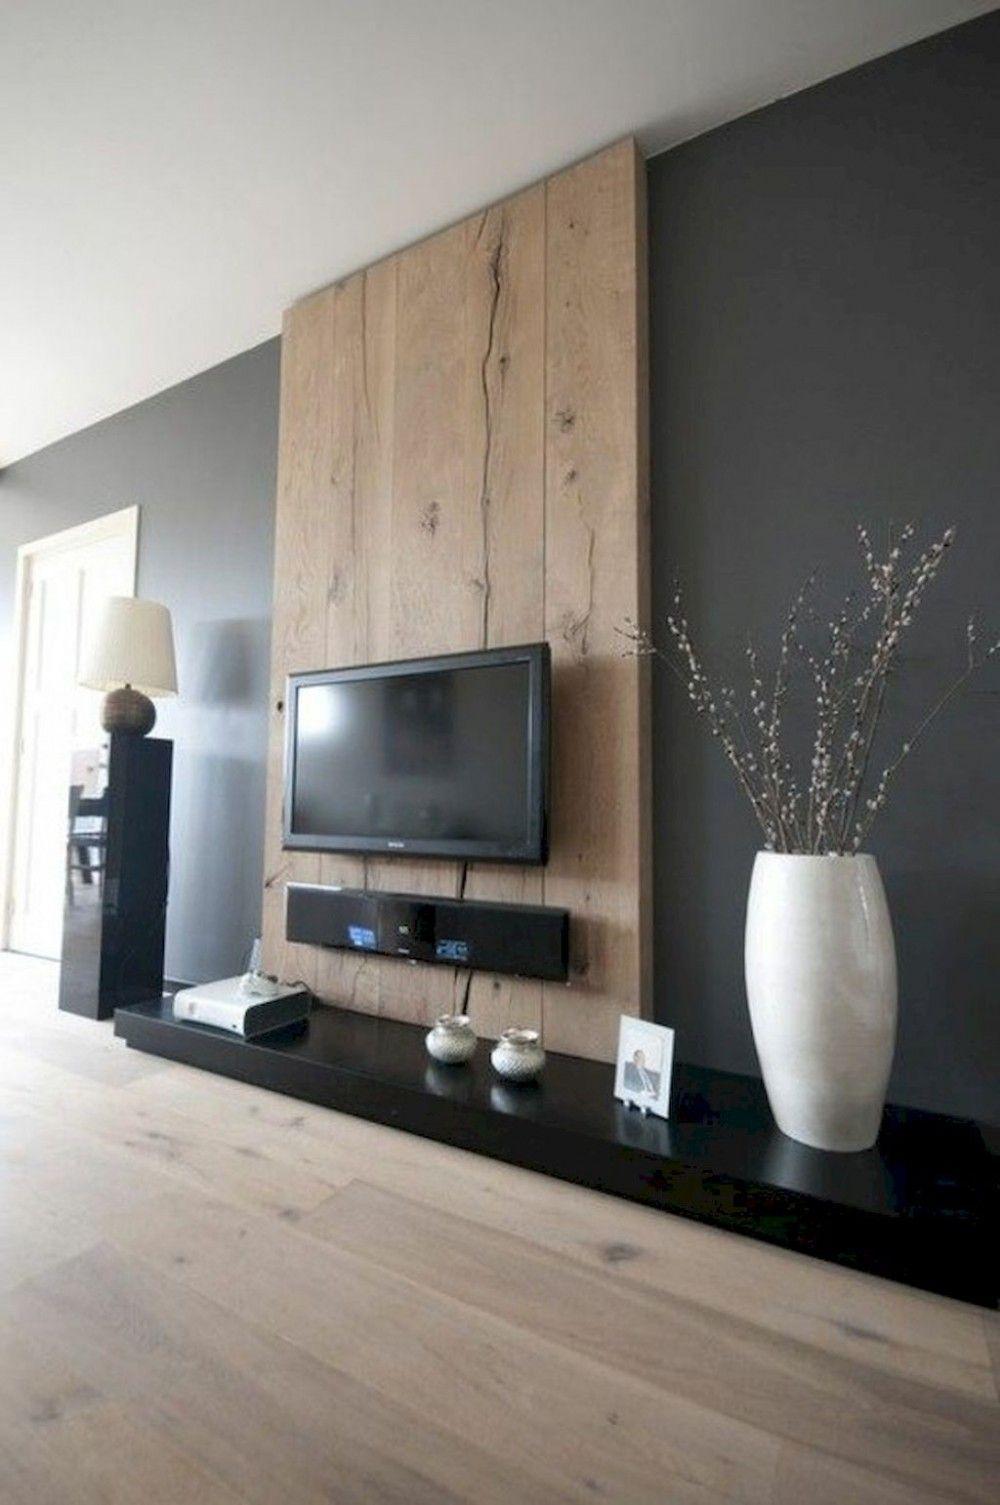 60 tv wall living room ideas decor on a